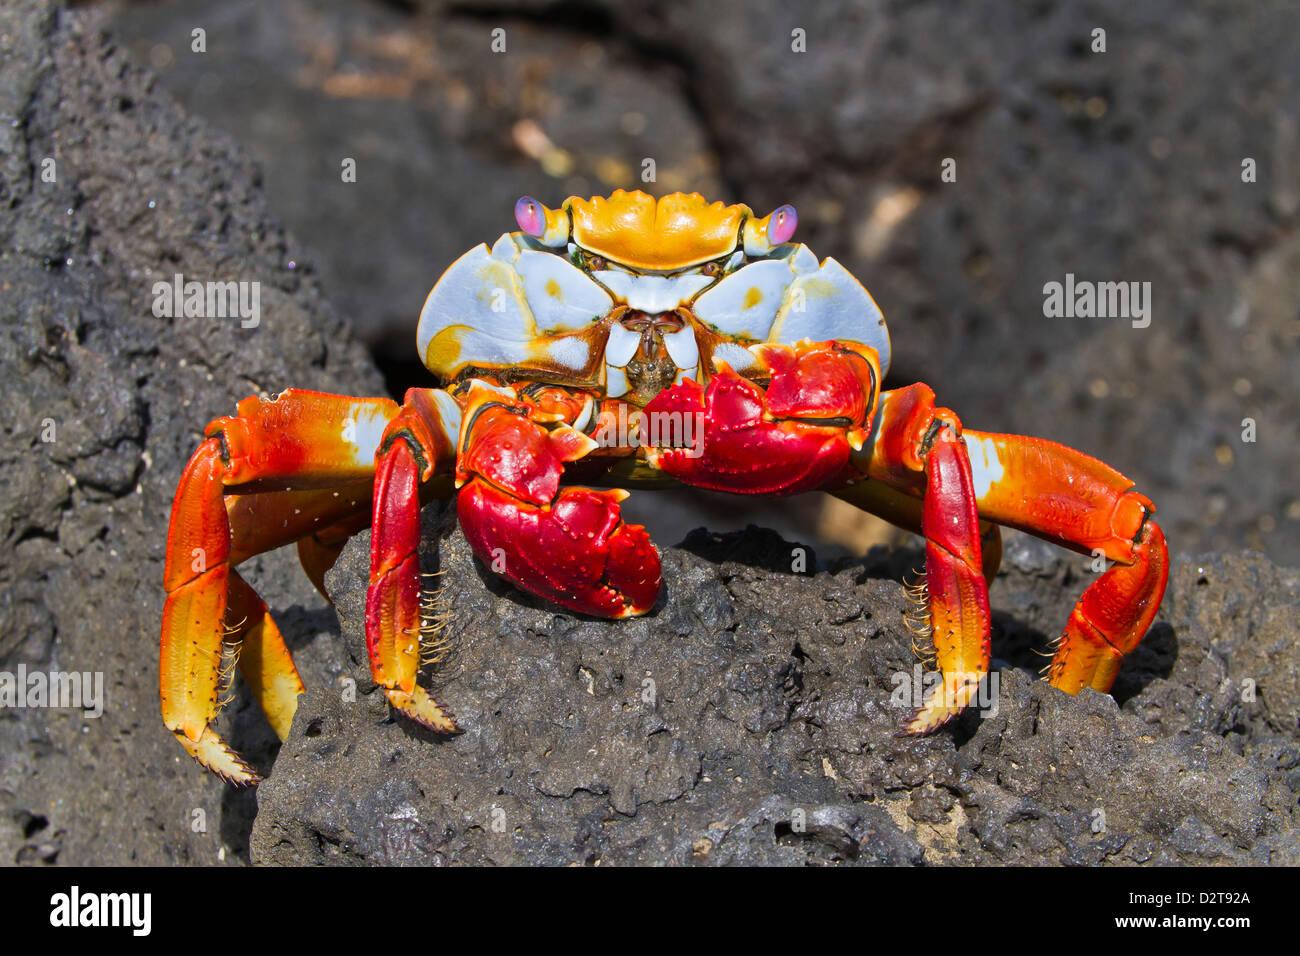 Sally lightfoot crab (Grapsus grapsus), Cerro Dragon, Santa Cruz Island, Galapagos Islands, Ecuador, South America - Stock Image